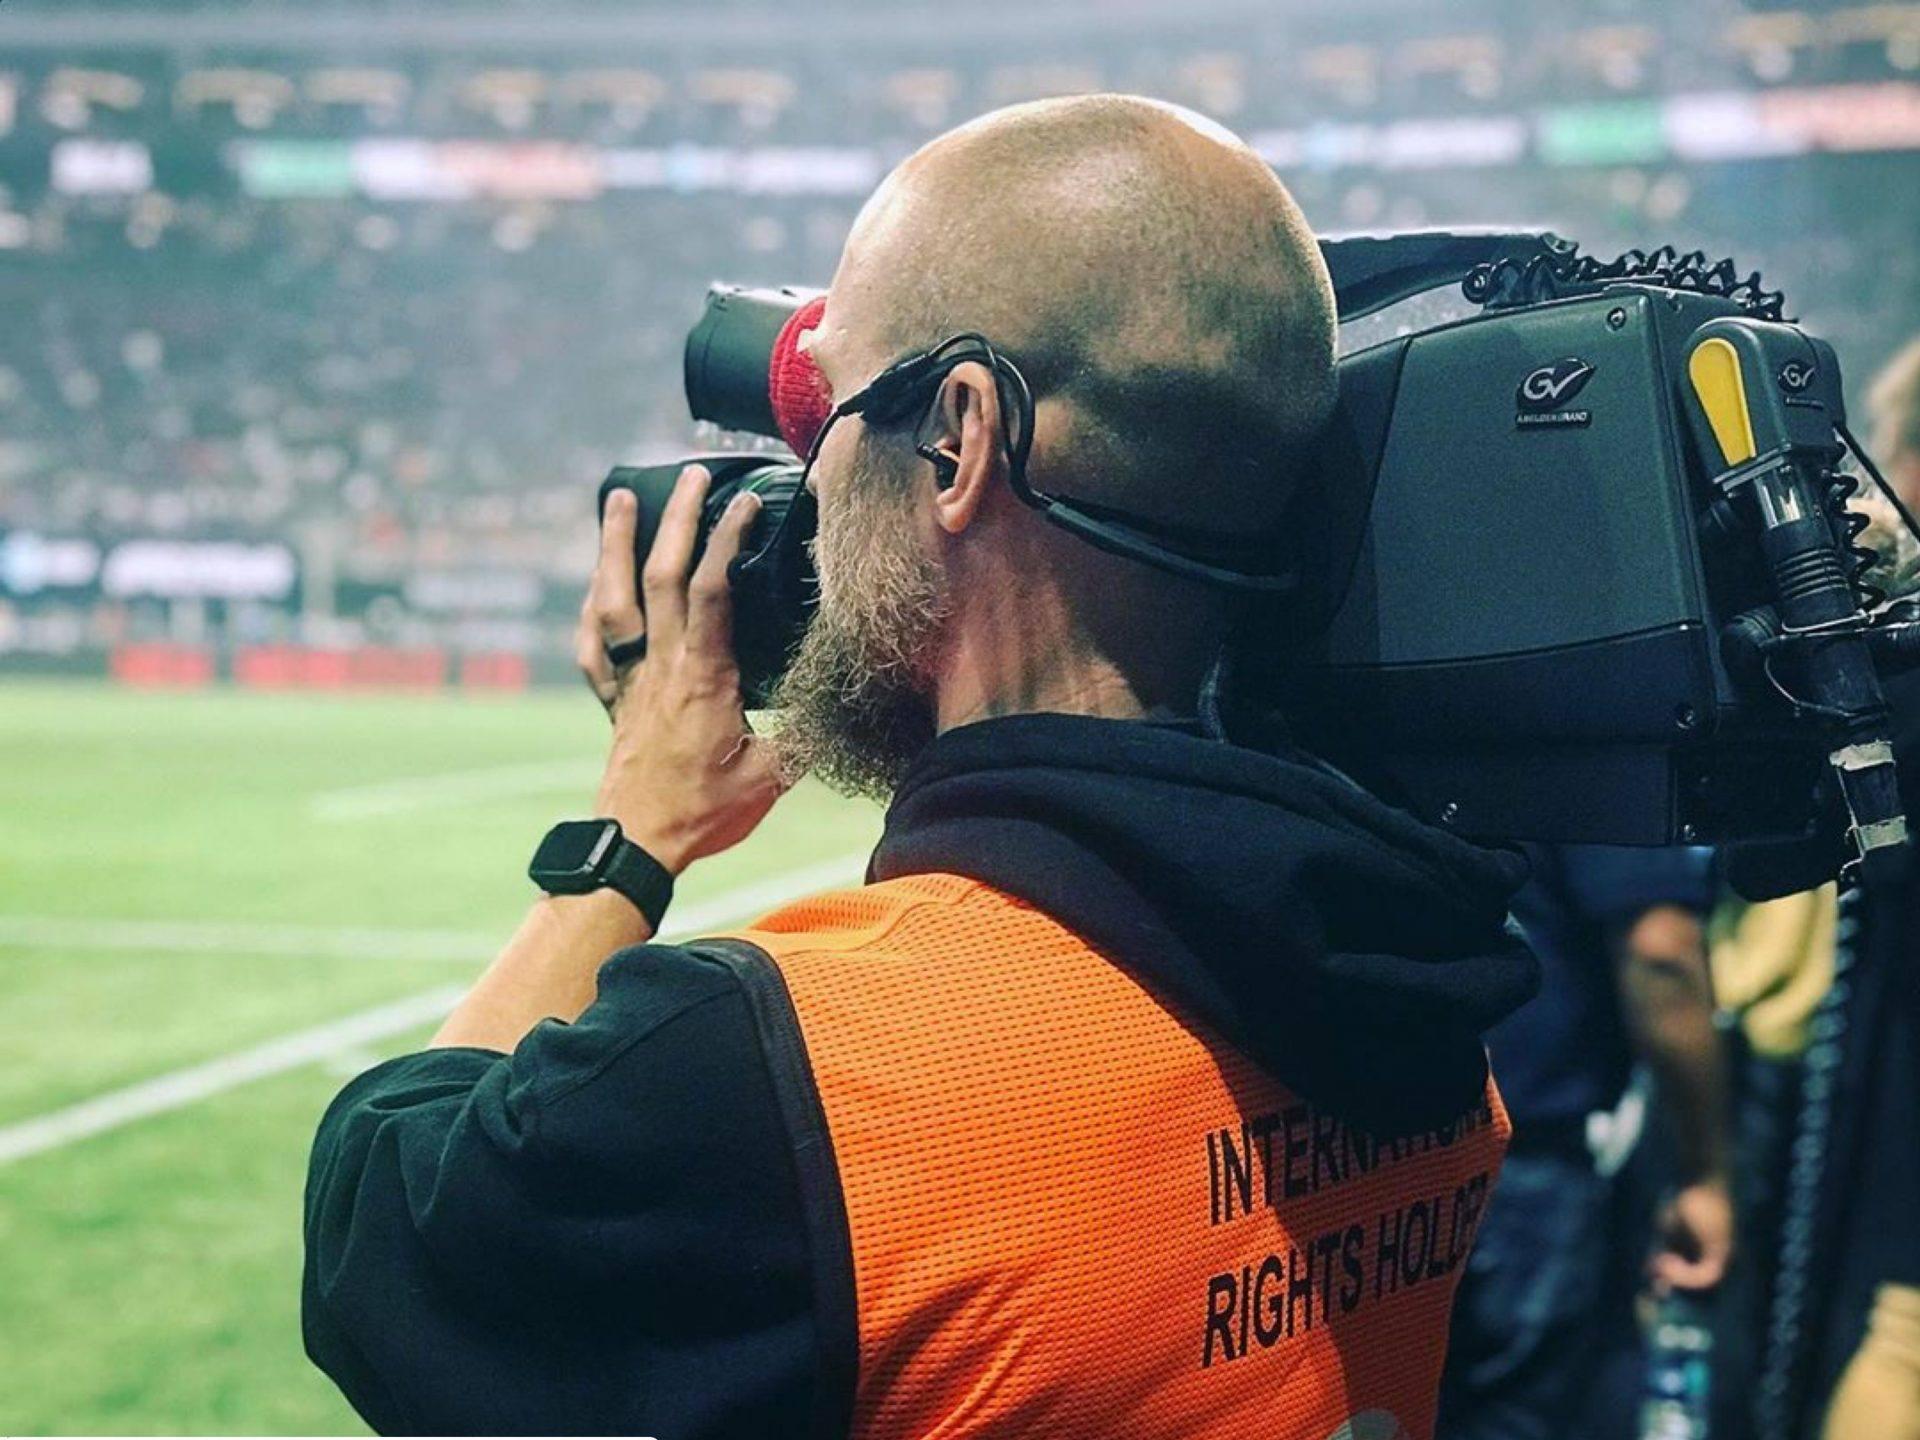 Shane Ross Camera operation - CM-i5 Headset